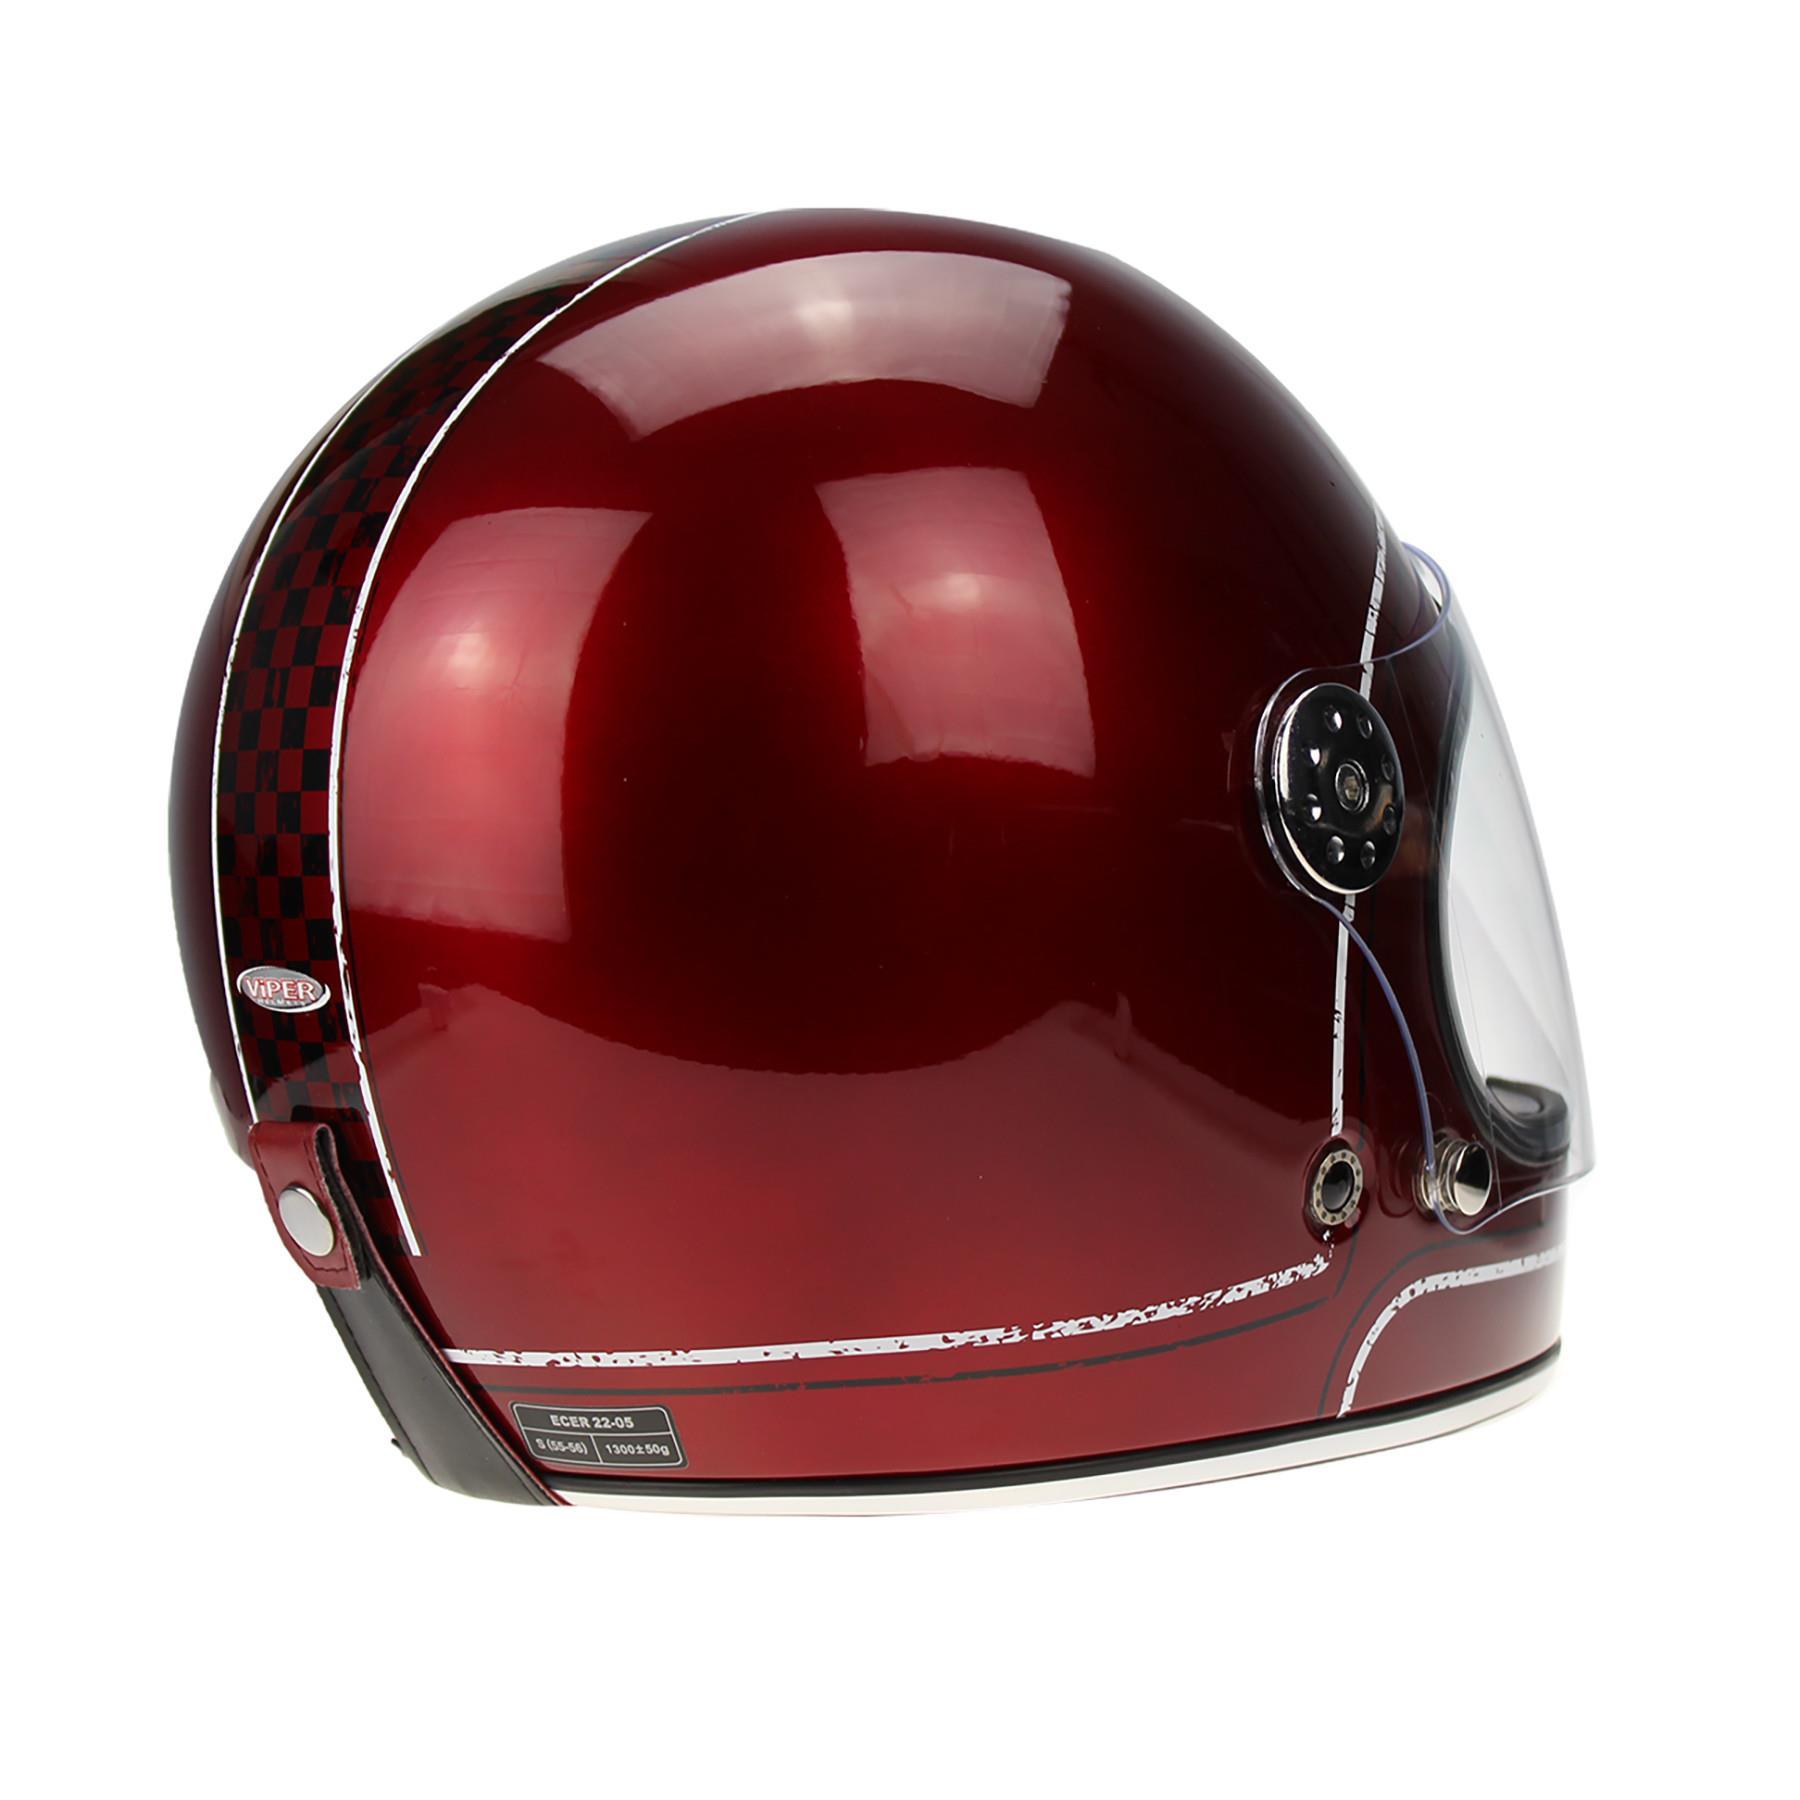 Viper-F656-Retro-Vintage-FibreGlass-Full-Face-Motorcycle-Bike-Road-Crash-Helmet miniature 11